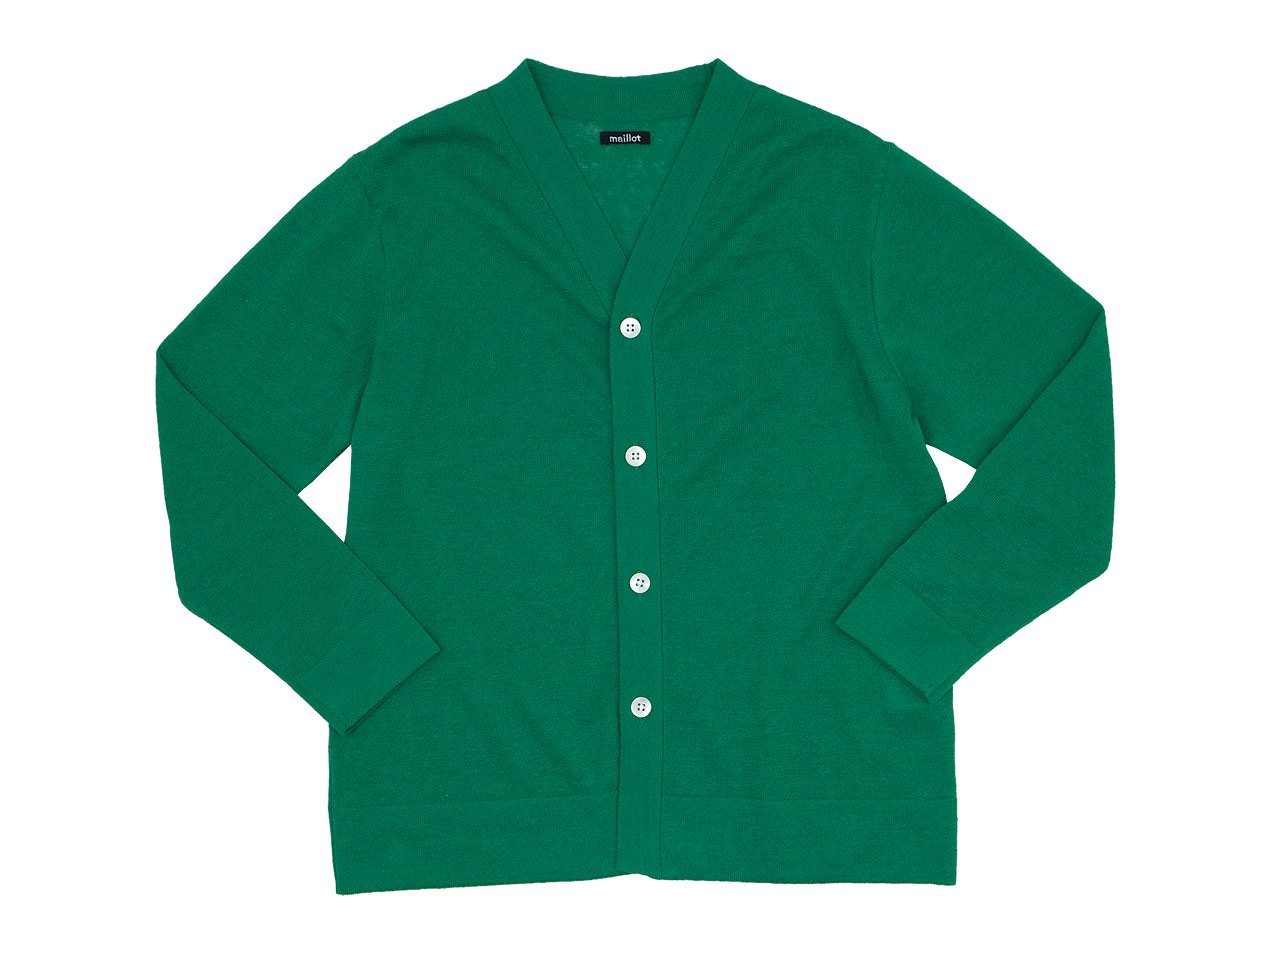 maillot mature summer cardigan GREEN